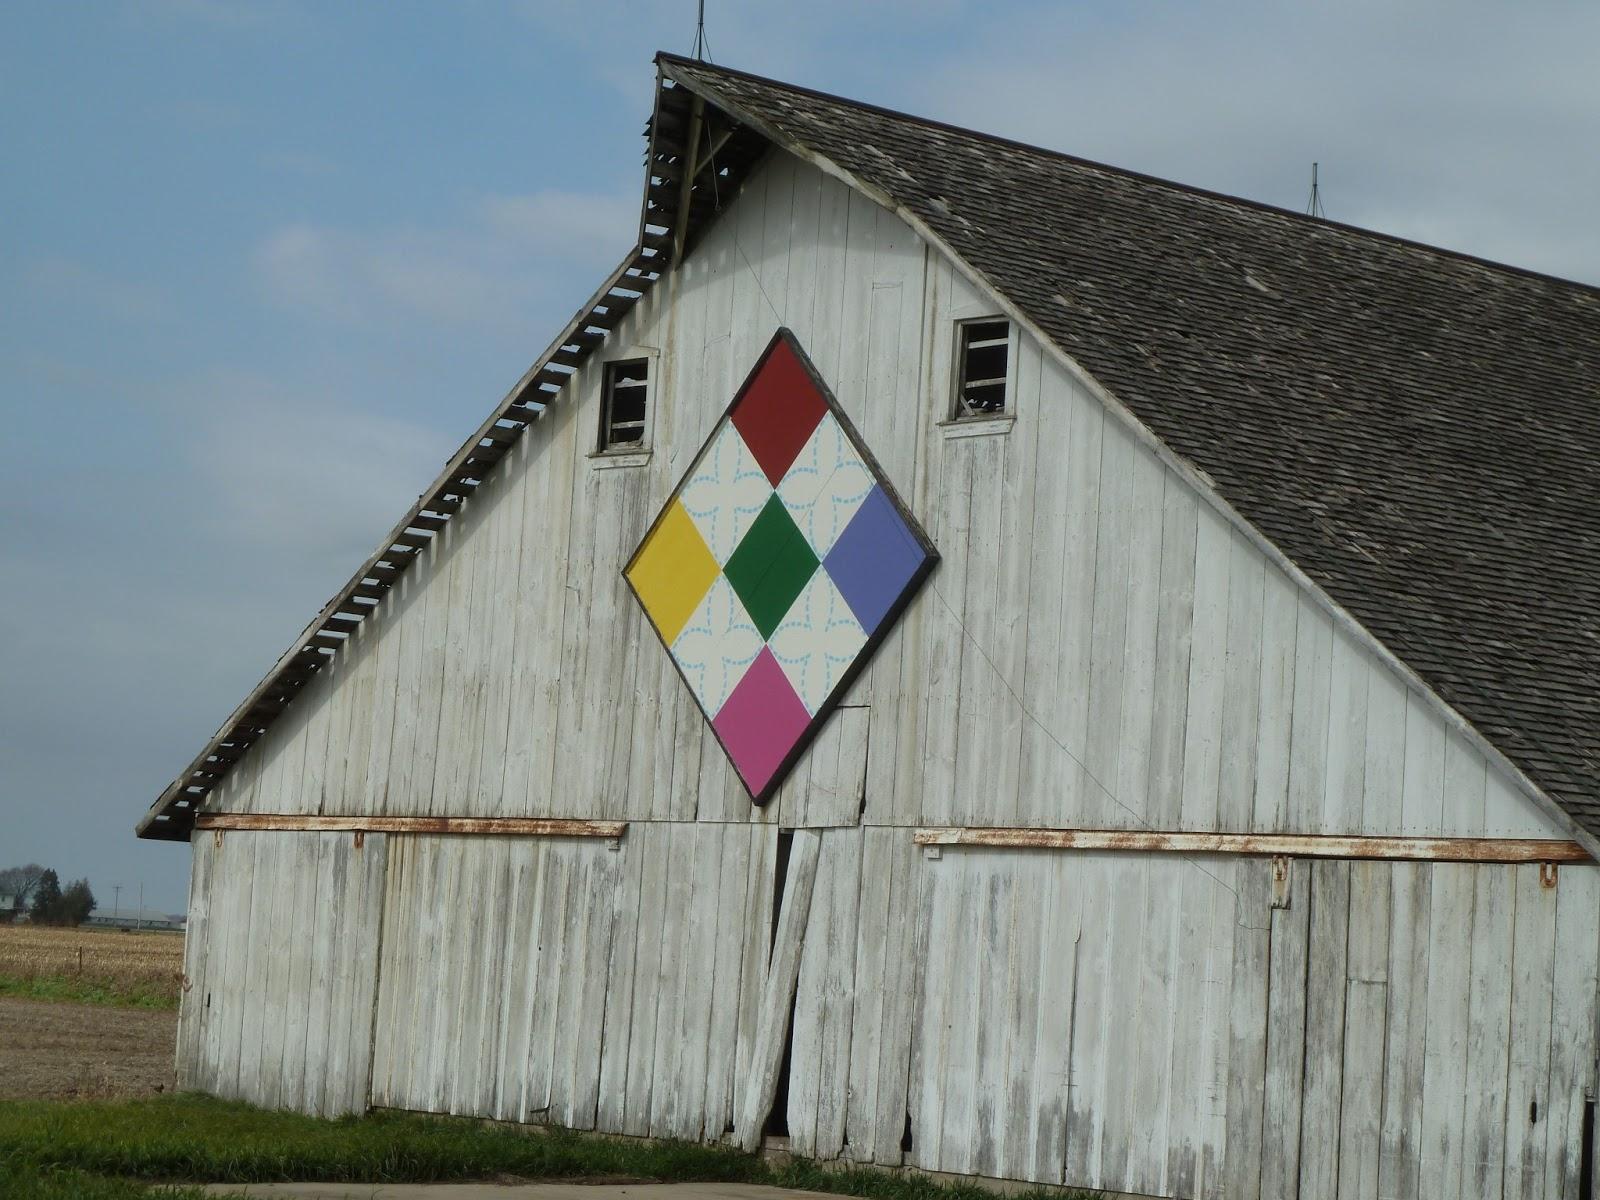 Barn Quilts More From Washington County Iowa Kalona